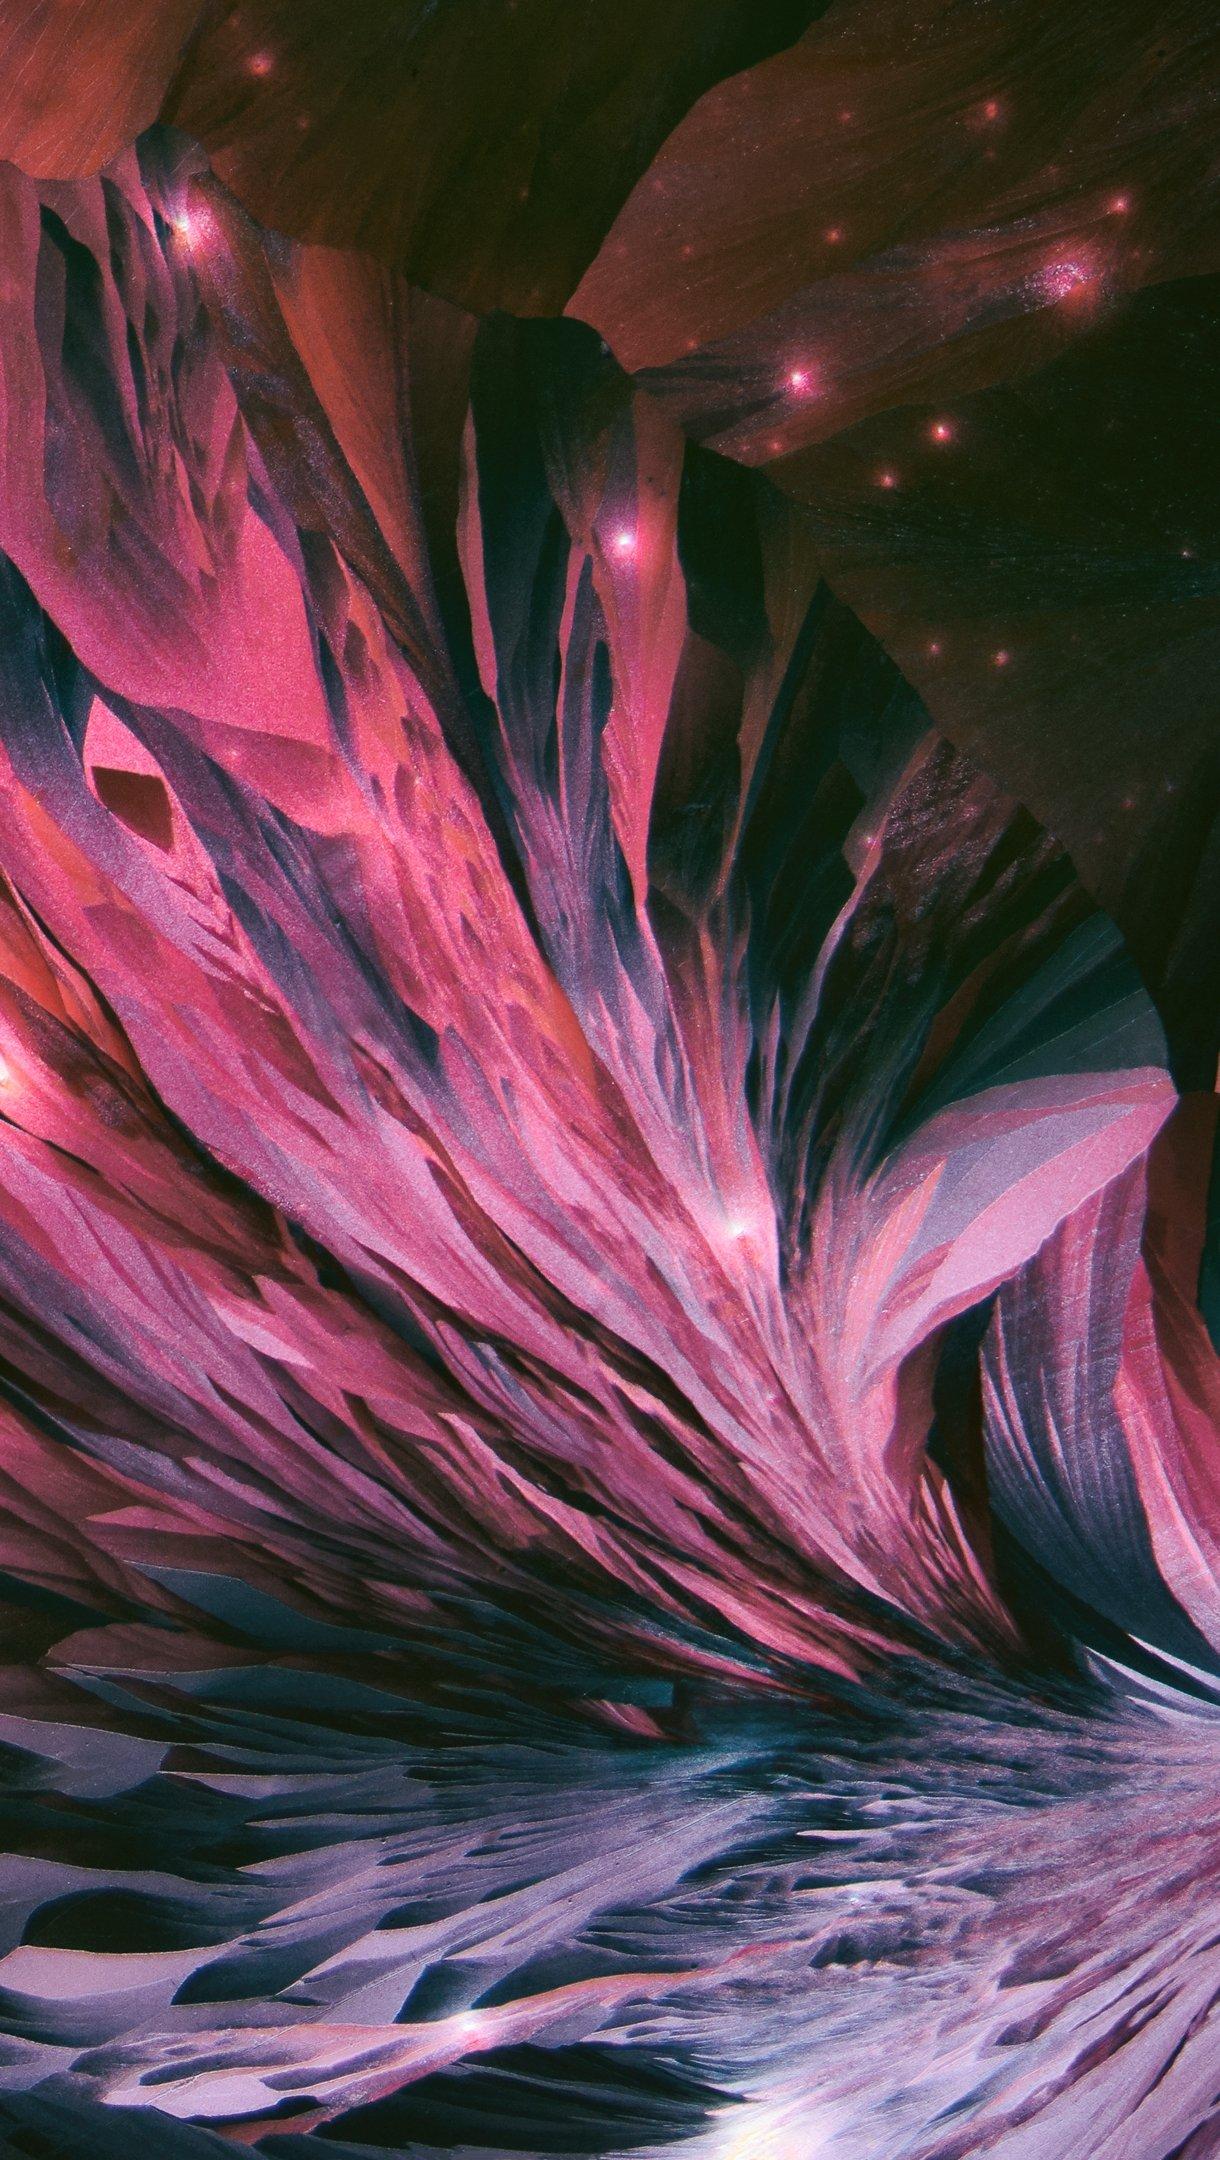 Fondos de pantalla Piedra preciosa rubi Abstracto Vertical